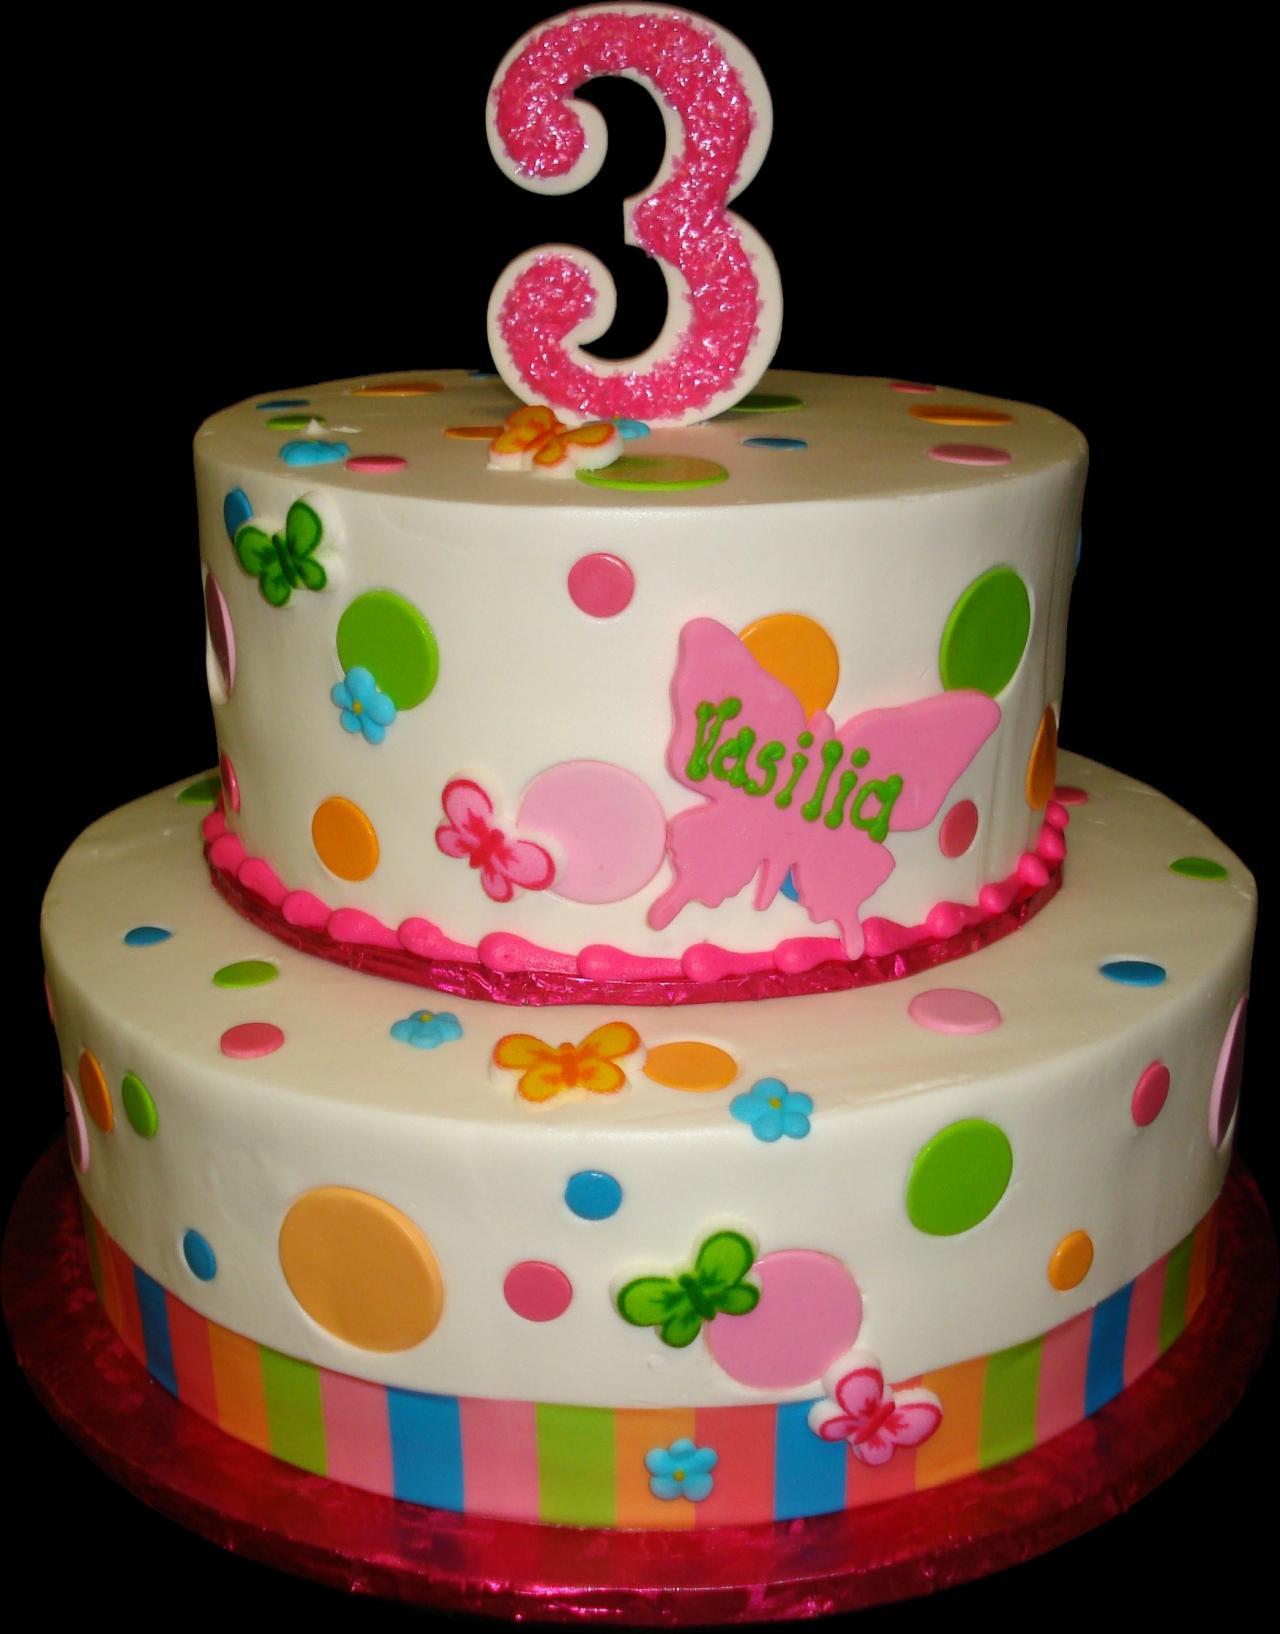 Cake Designs For Baby Girl 3rd Birthday : Birthday Cakes Sugar Showcase